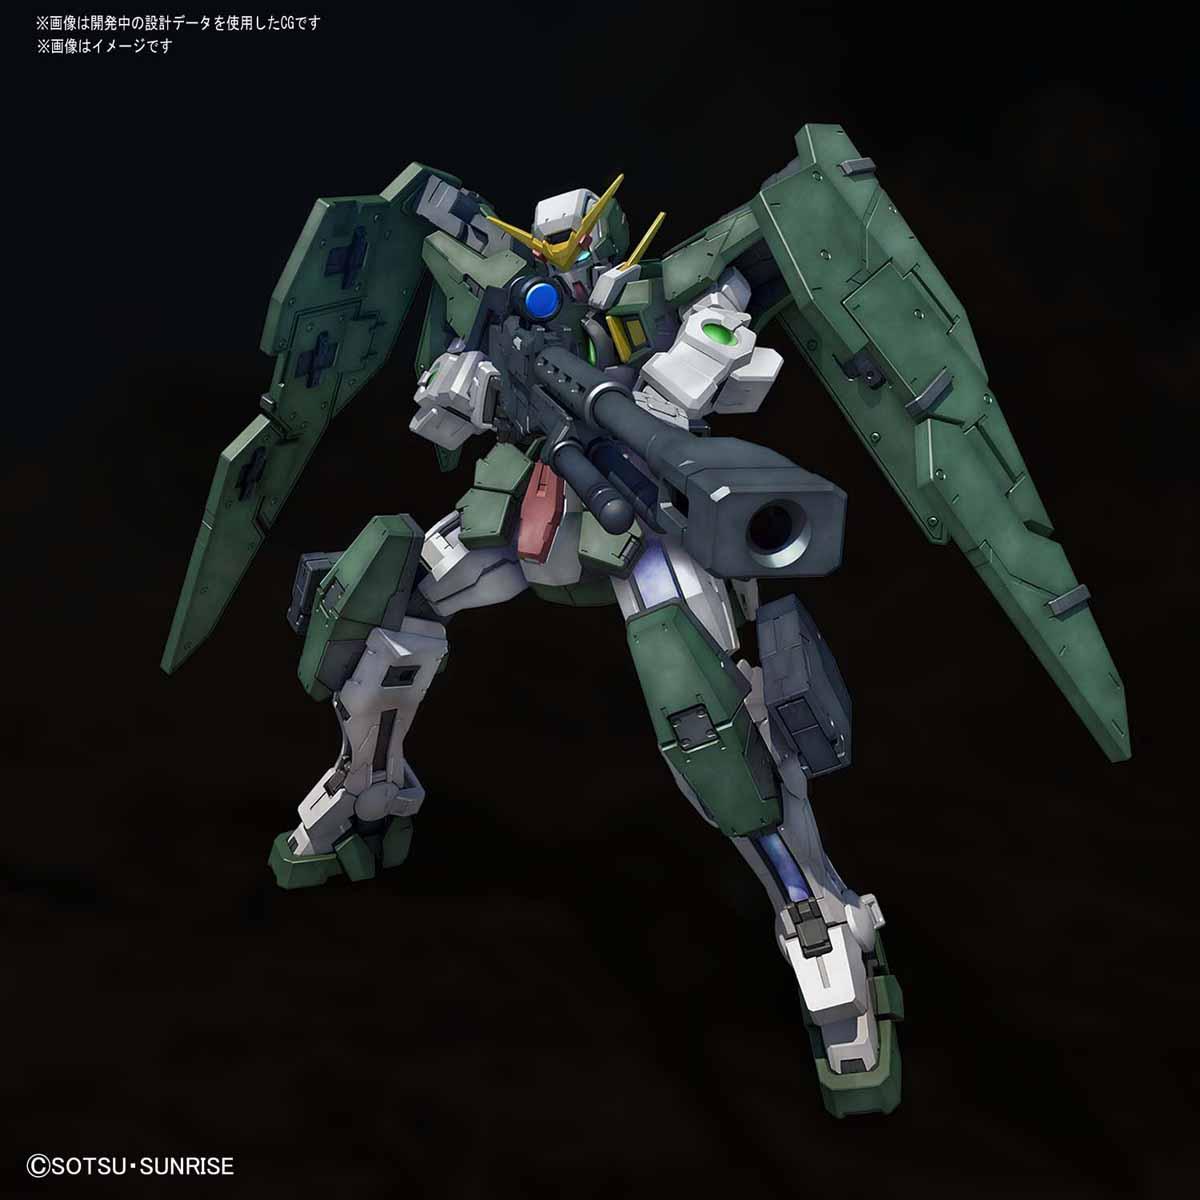 GN-002 ガンダムデュナメス [Gundam Dynames]